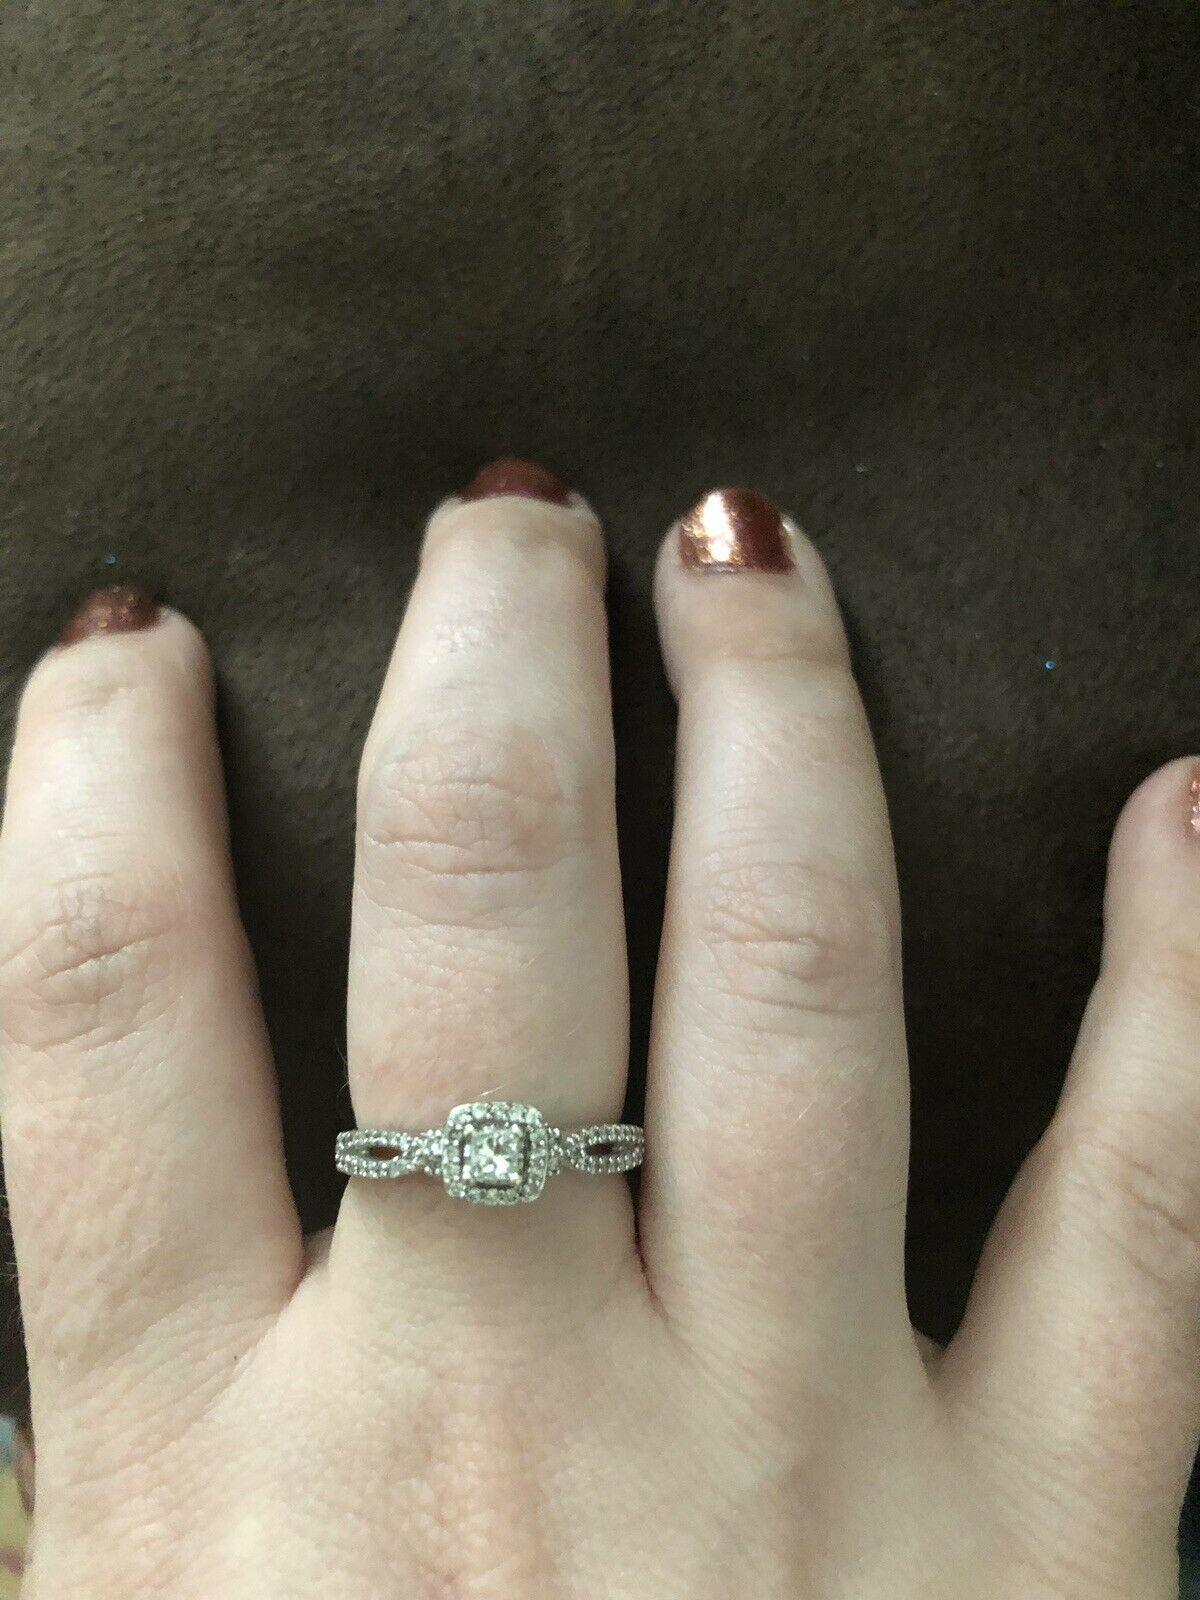 75 Carat Diamond Engagement Ring Size 6 Black Diamond Ring Ideas Of Black Diamond Diamond Engagement Rings Black Diamond Ring Engagement Wedding Ring Sets